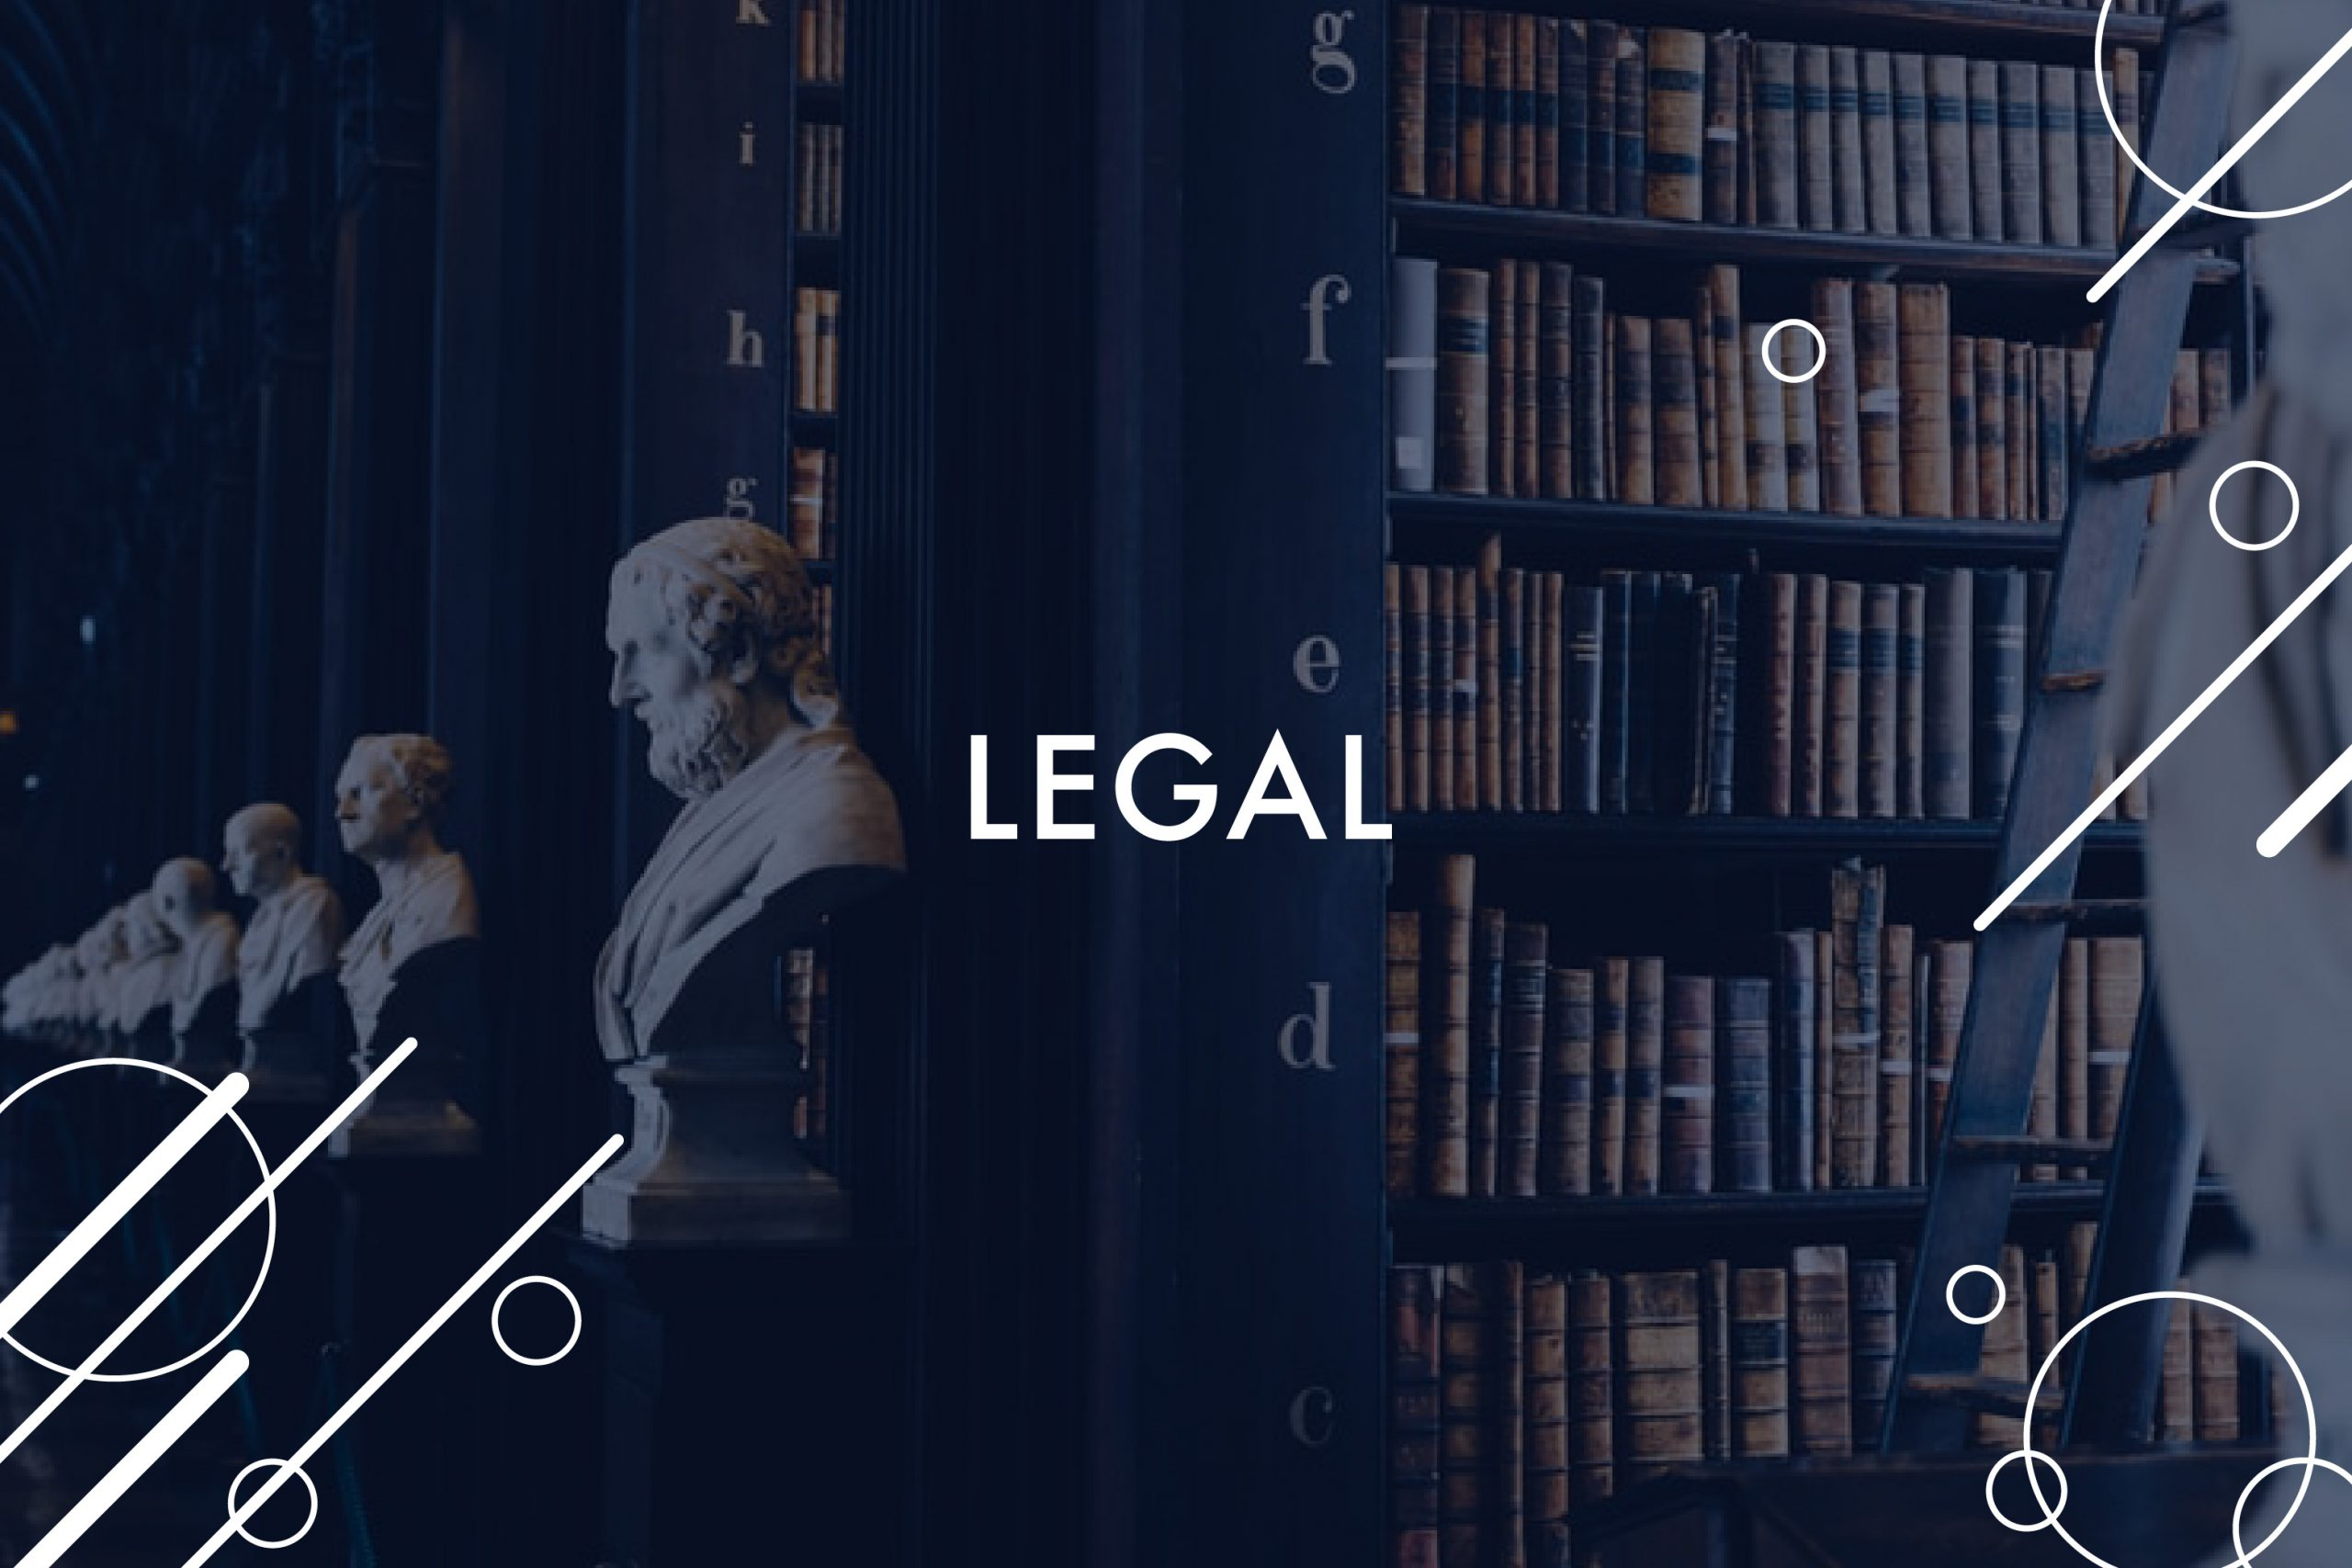 asesoria legal, sat, veracruz, leyes, derechos, profeco, legal, fiscal, contable